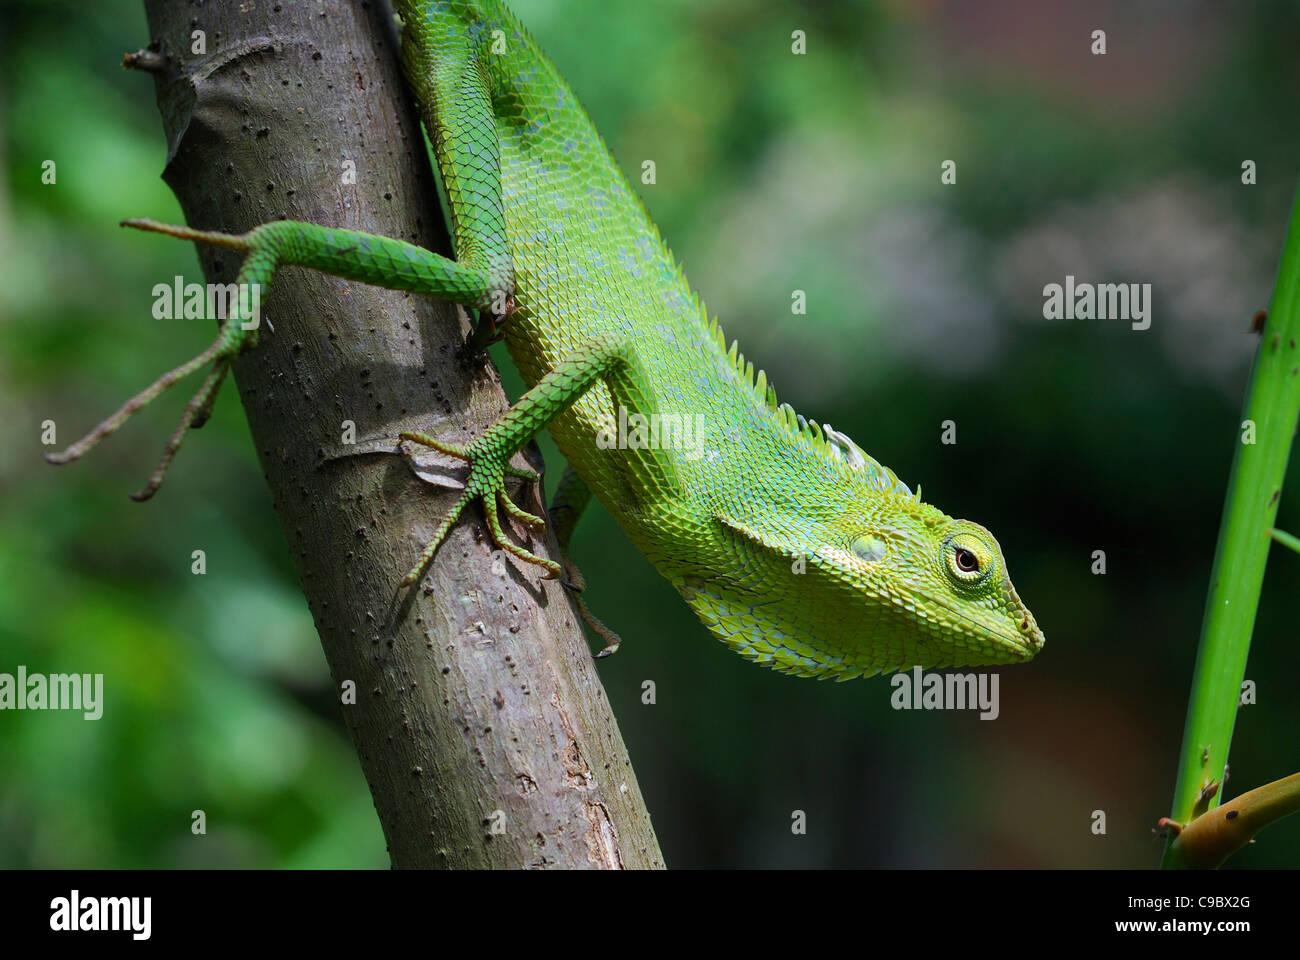 Green Tree Dragon Green Crested Lizard Borneo Bloodsucker Stock